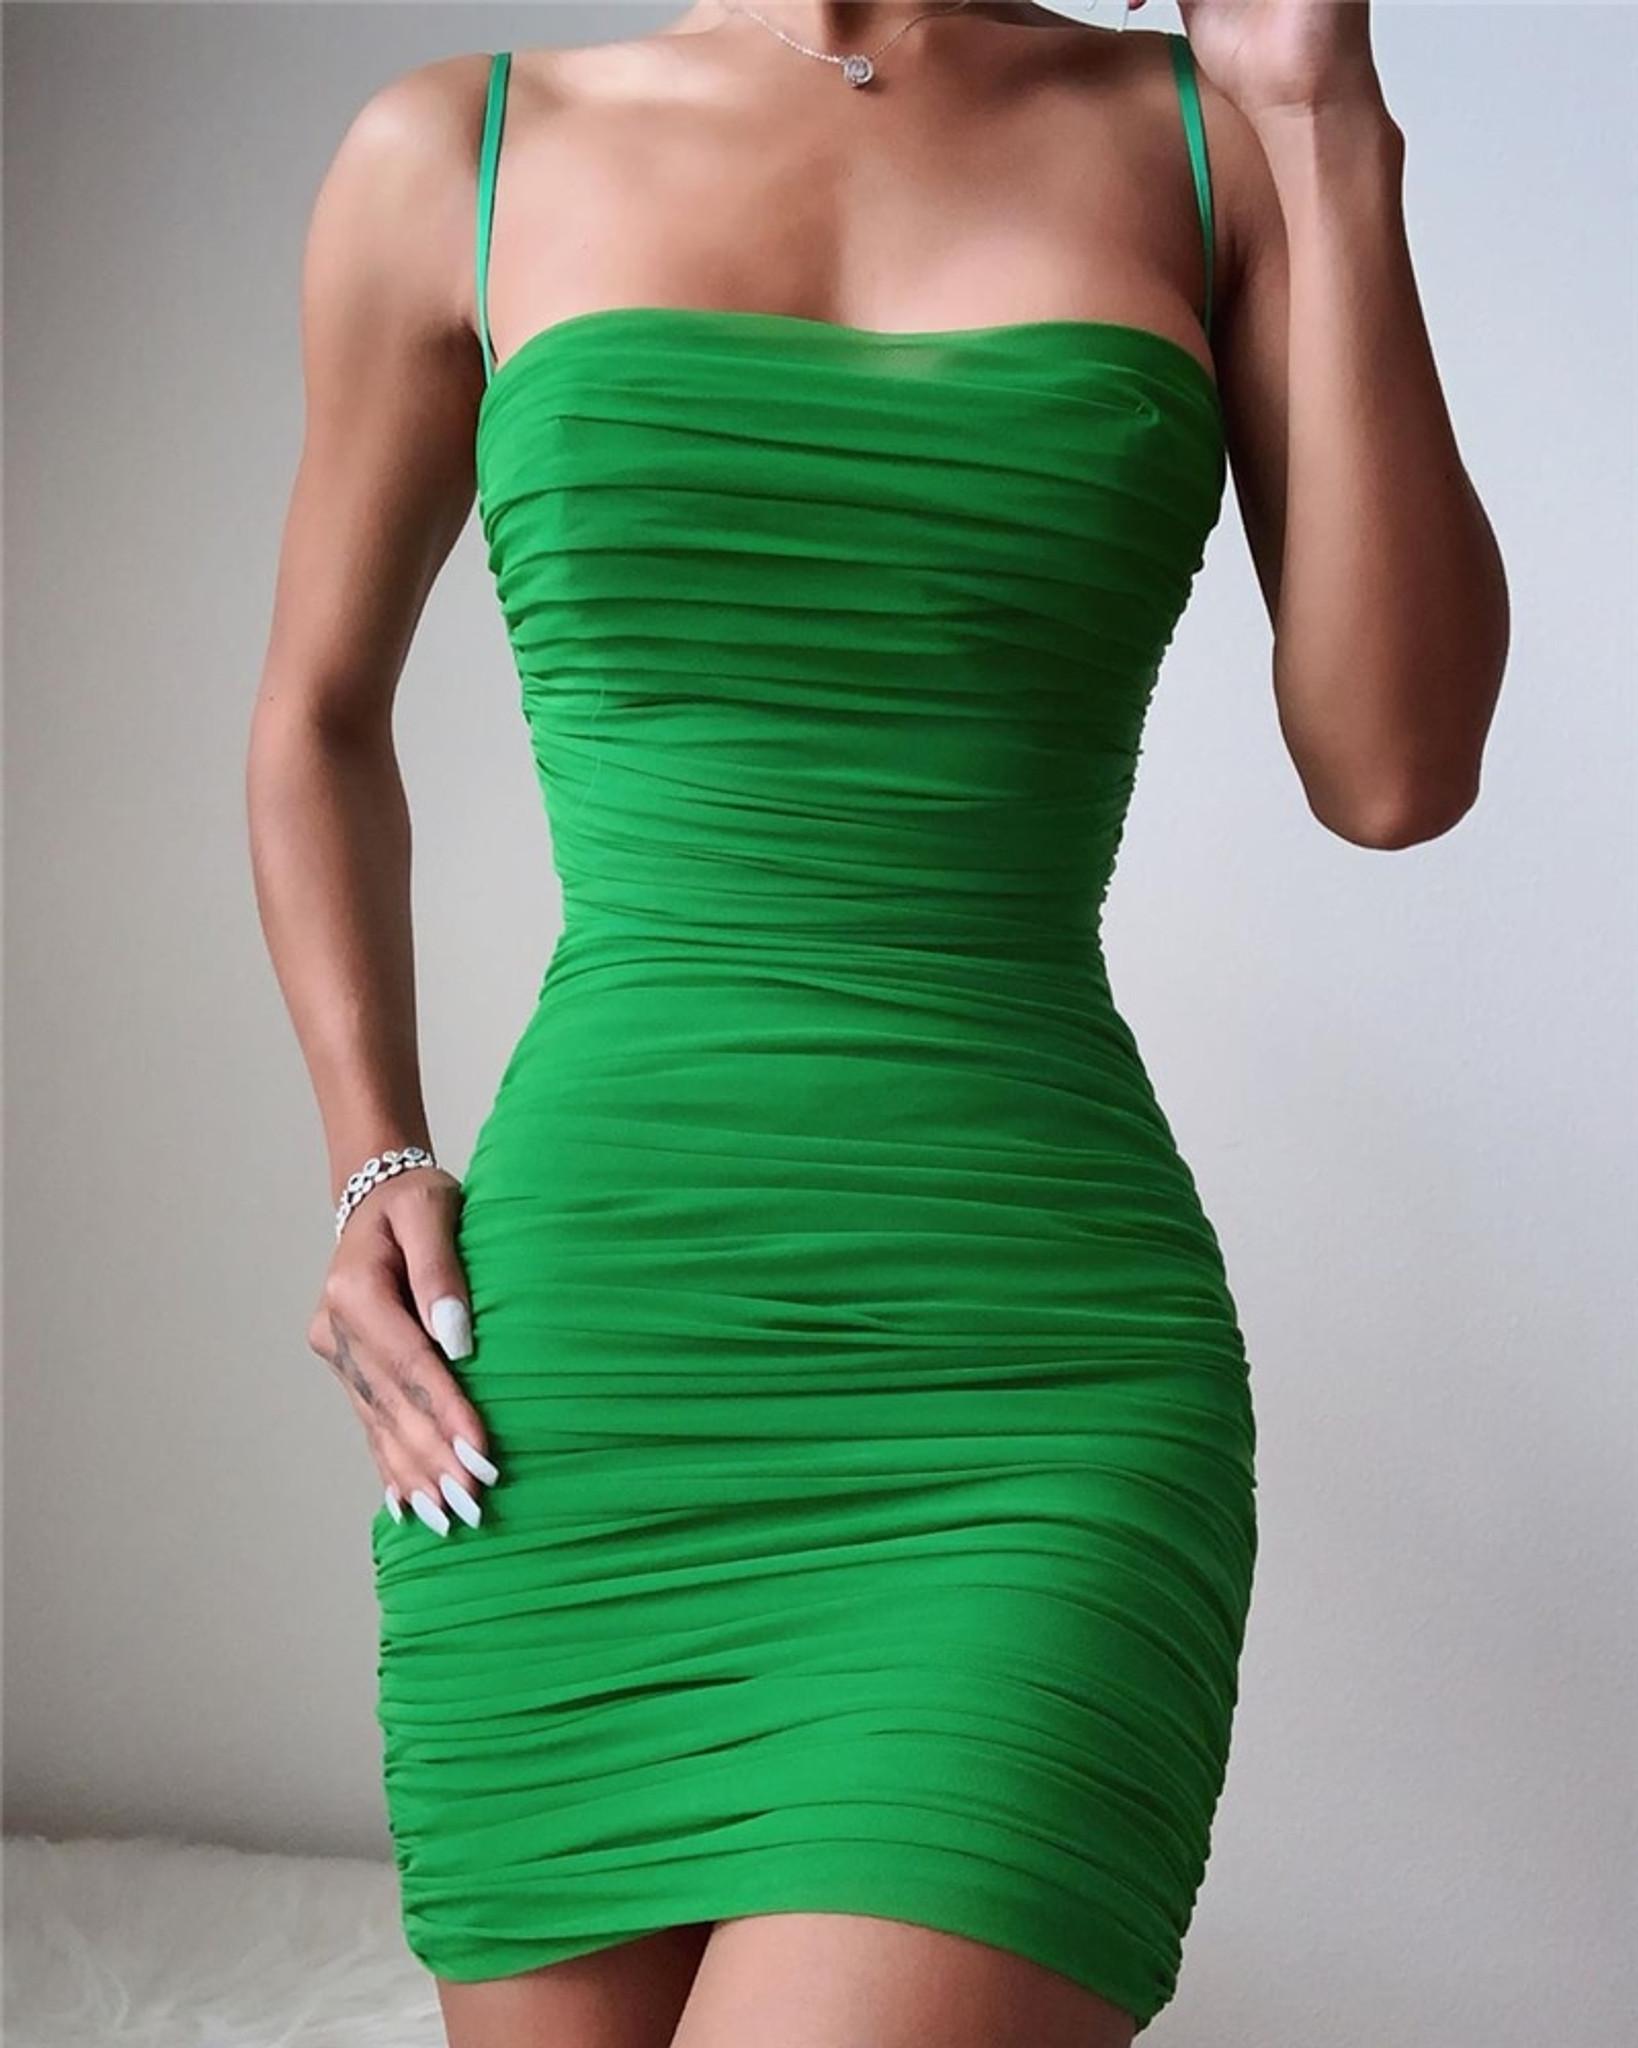 Ruched Semi Sheer Dress